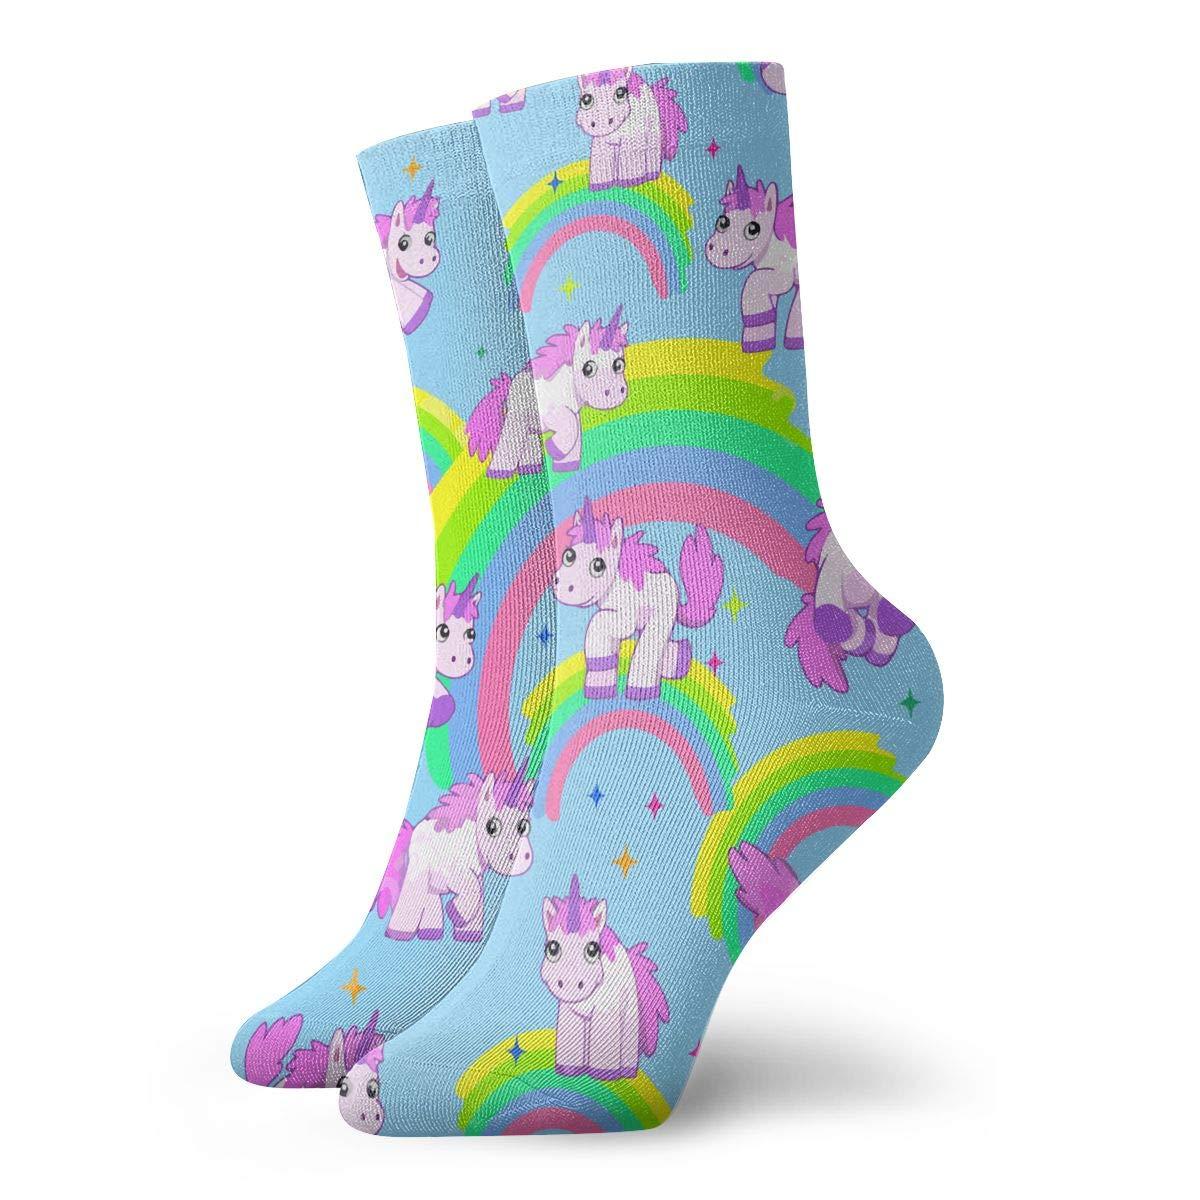 Unicorn-Rainbow Unisex Funny Casual Crew Socks Athletic Socks For Boys Girls Kids Teenagers